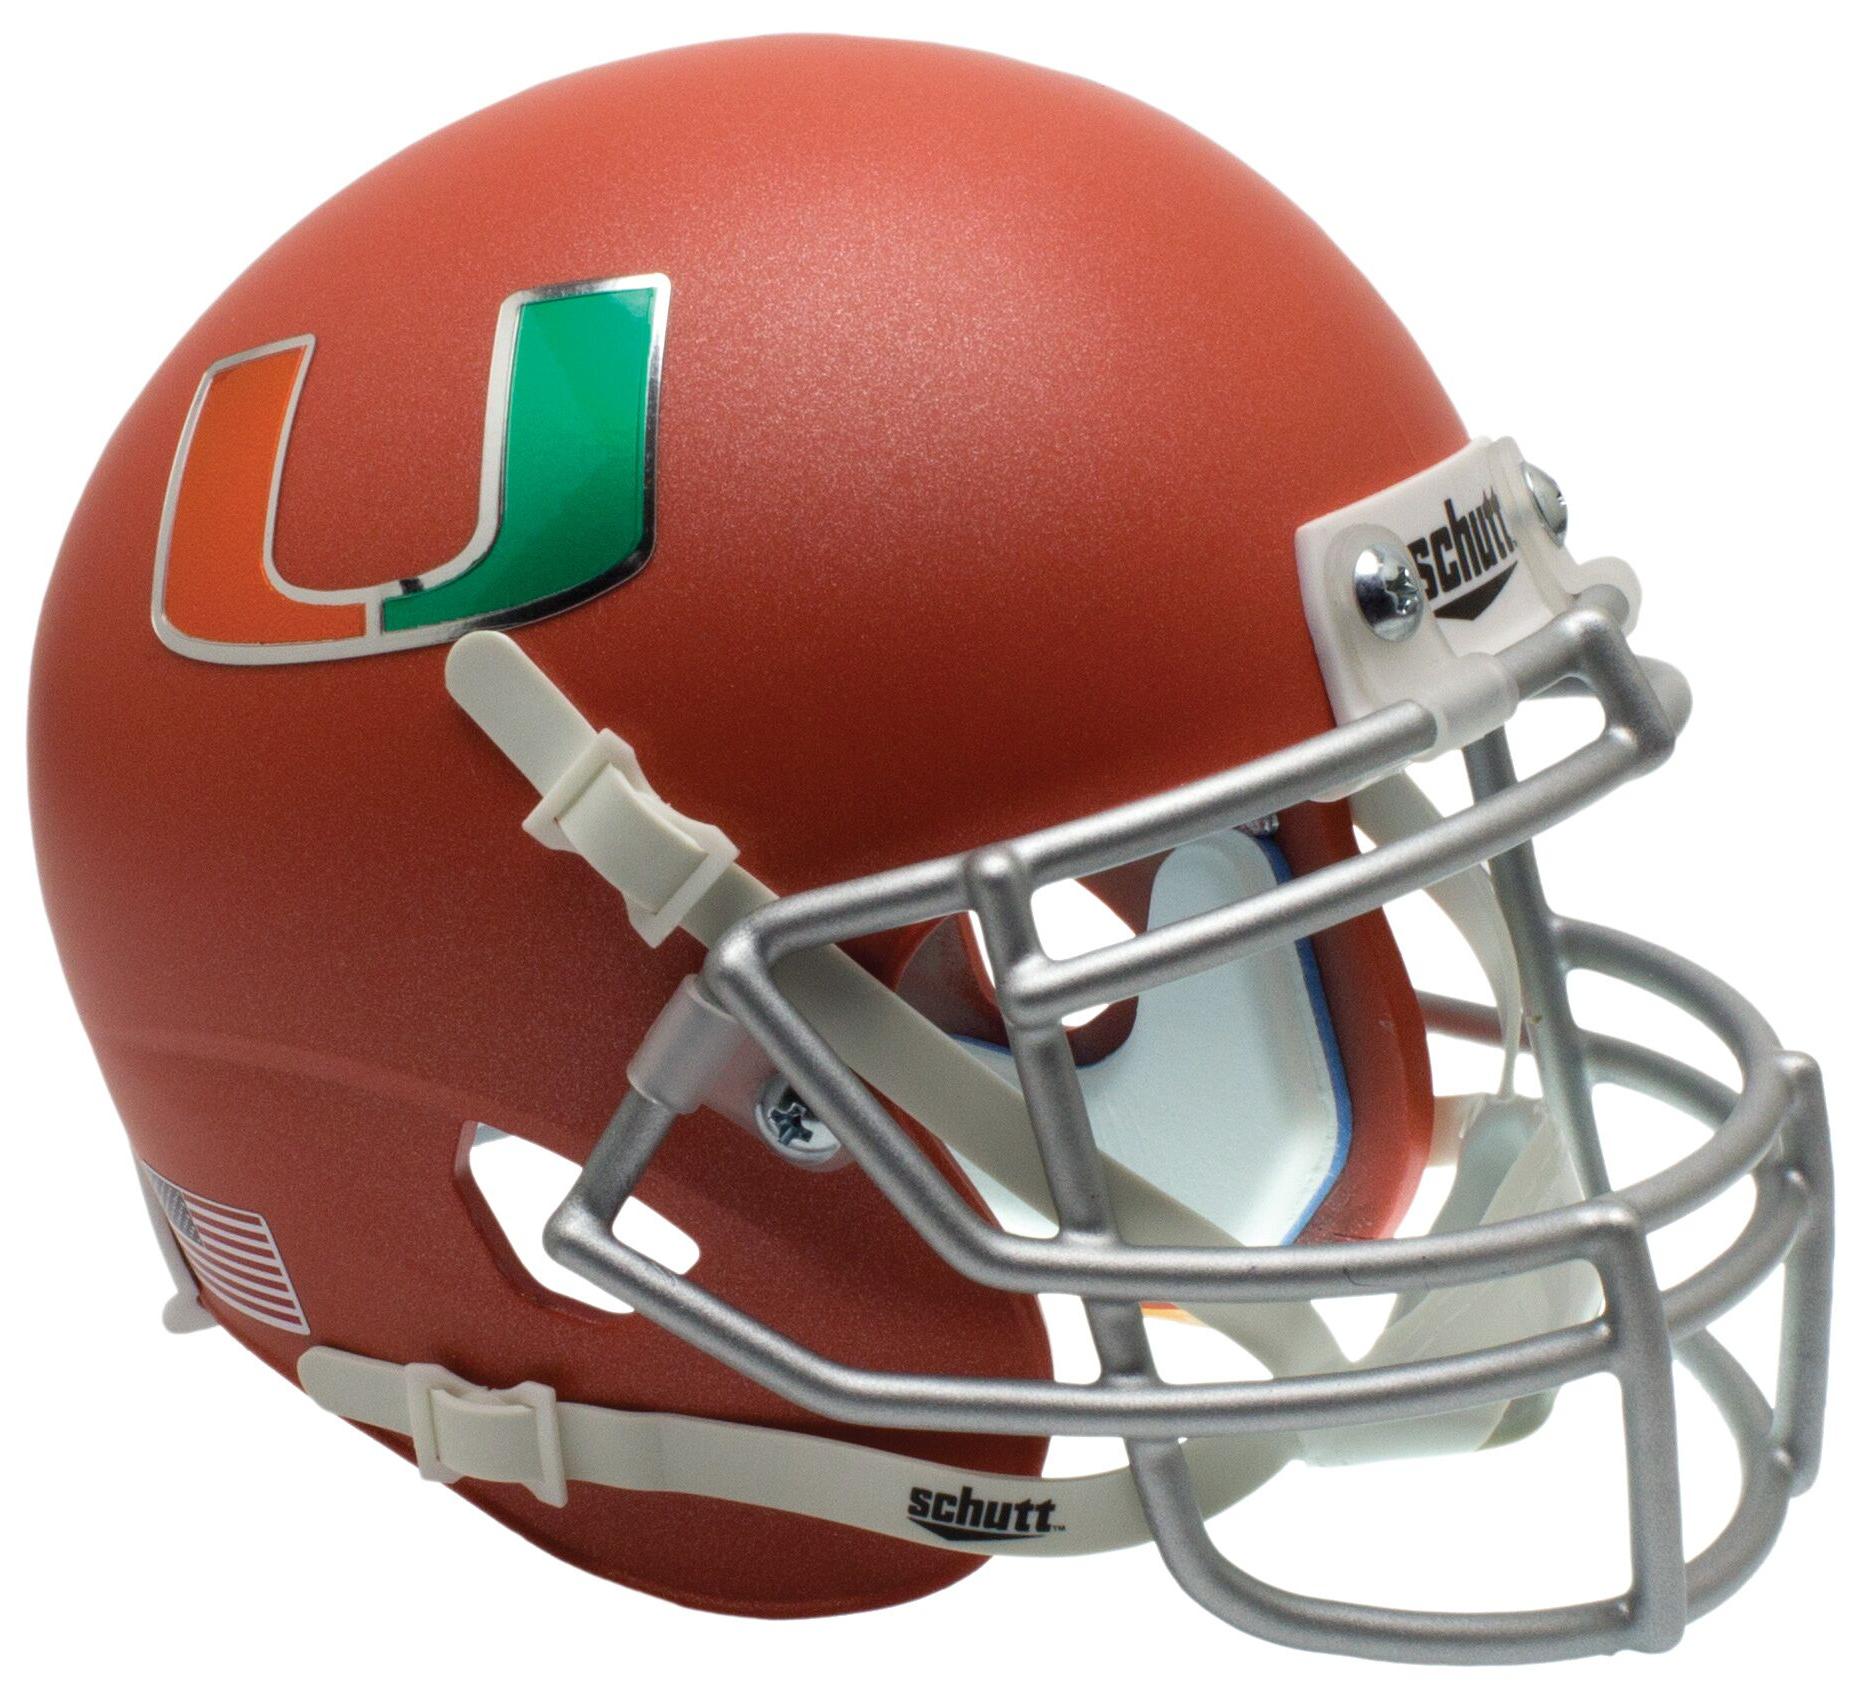 Miami Hurricanes Full XP Replica Football Helmet Schutt <B>Orange</B>